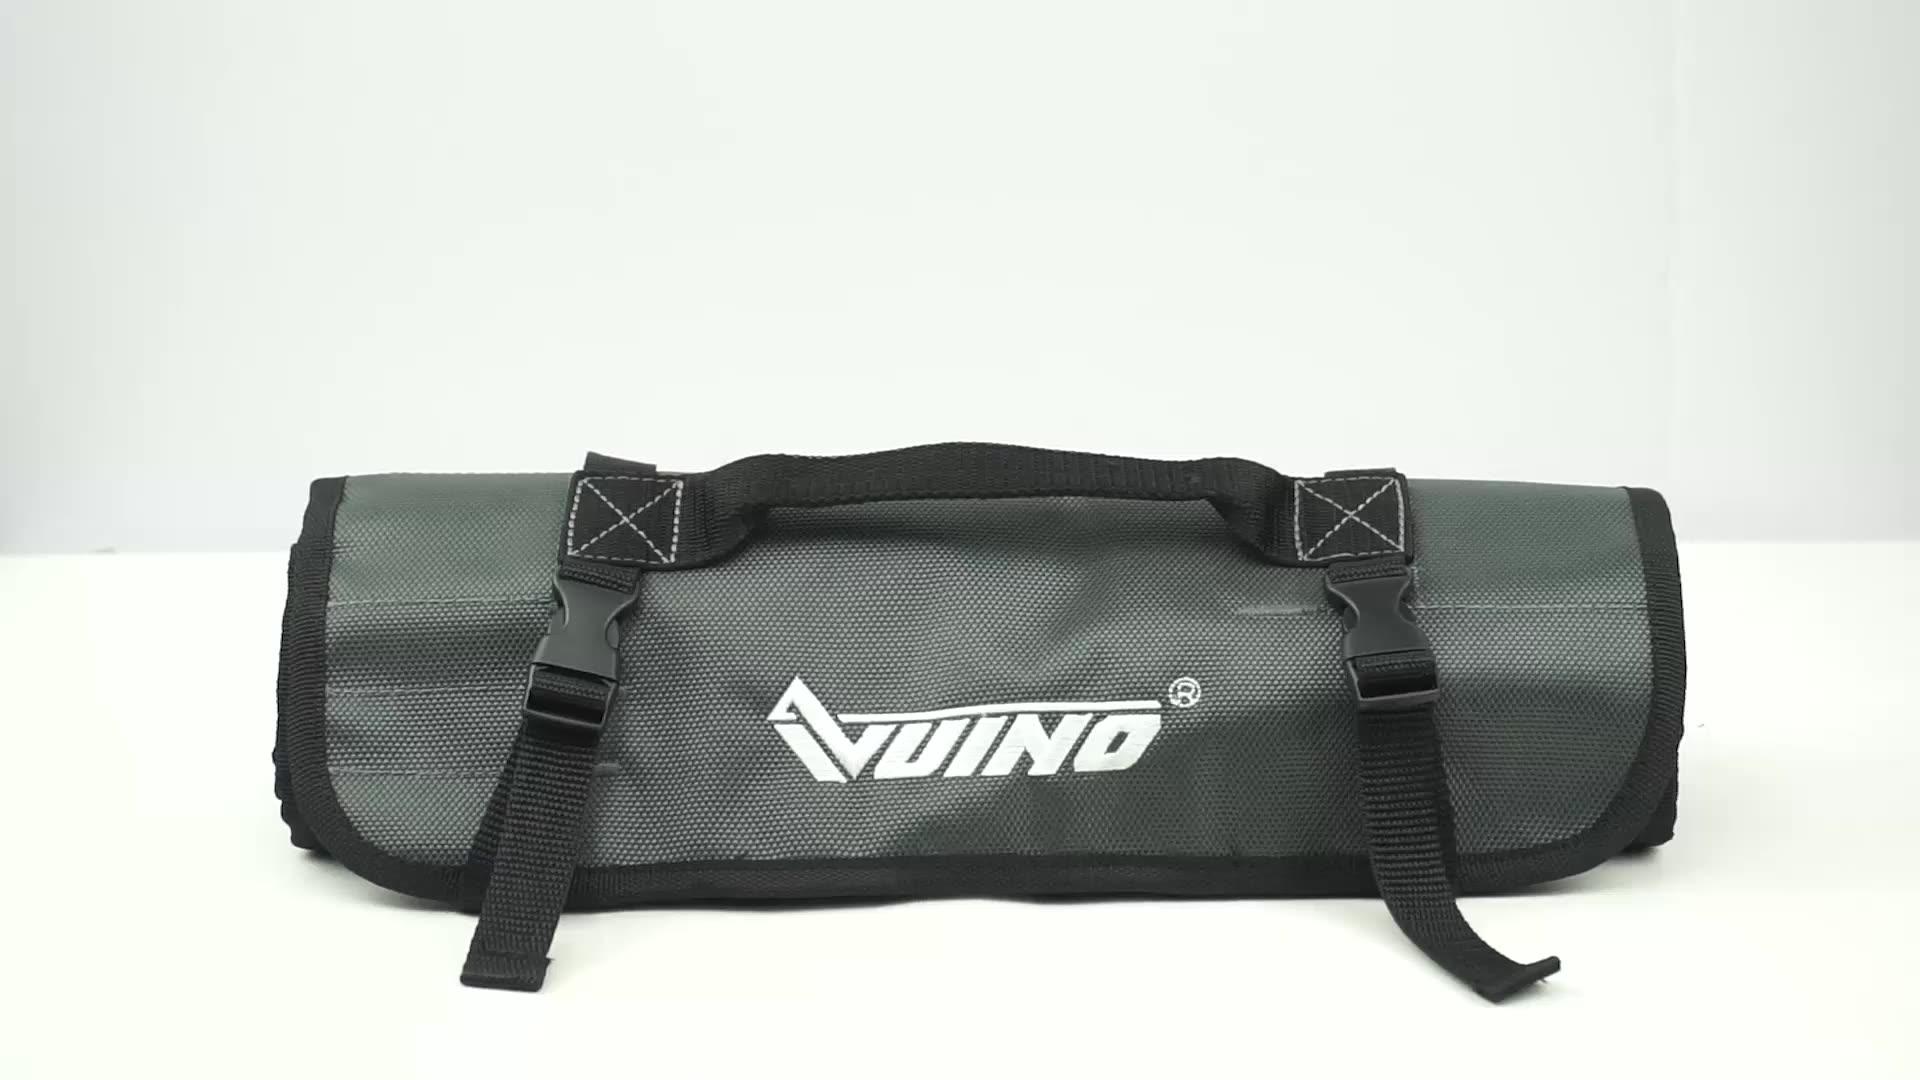 VUINO waterproof Lightweight Electrician Multifunctional roll tool bag